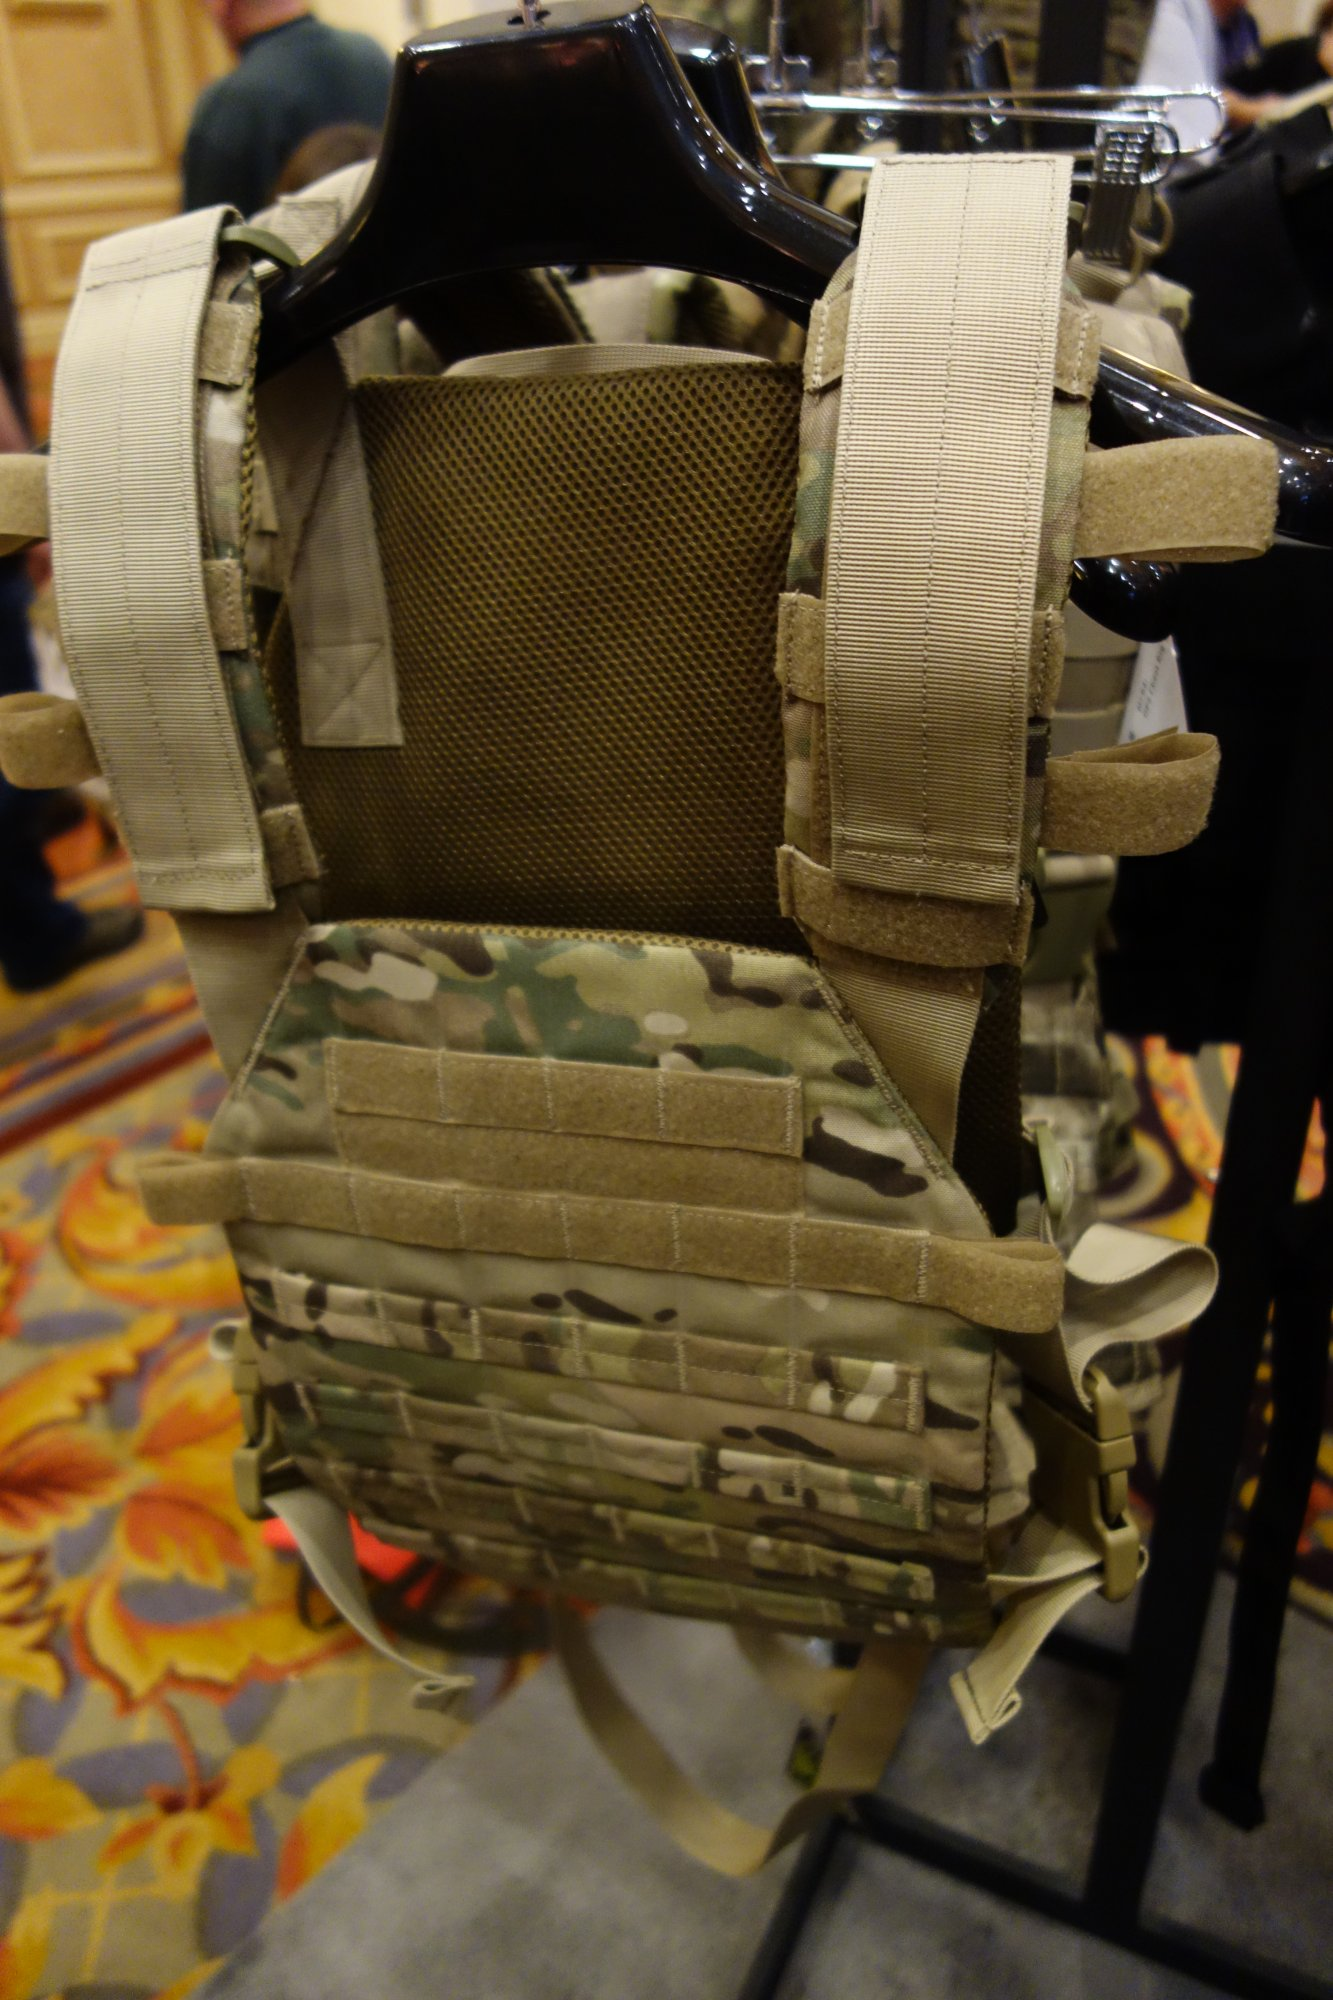 Condor Sentry Lightweight Tactical Armor Plate Carrier